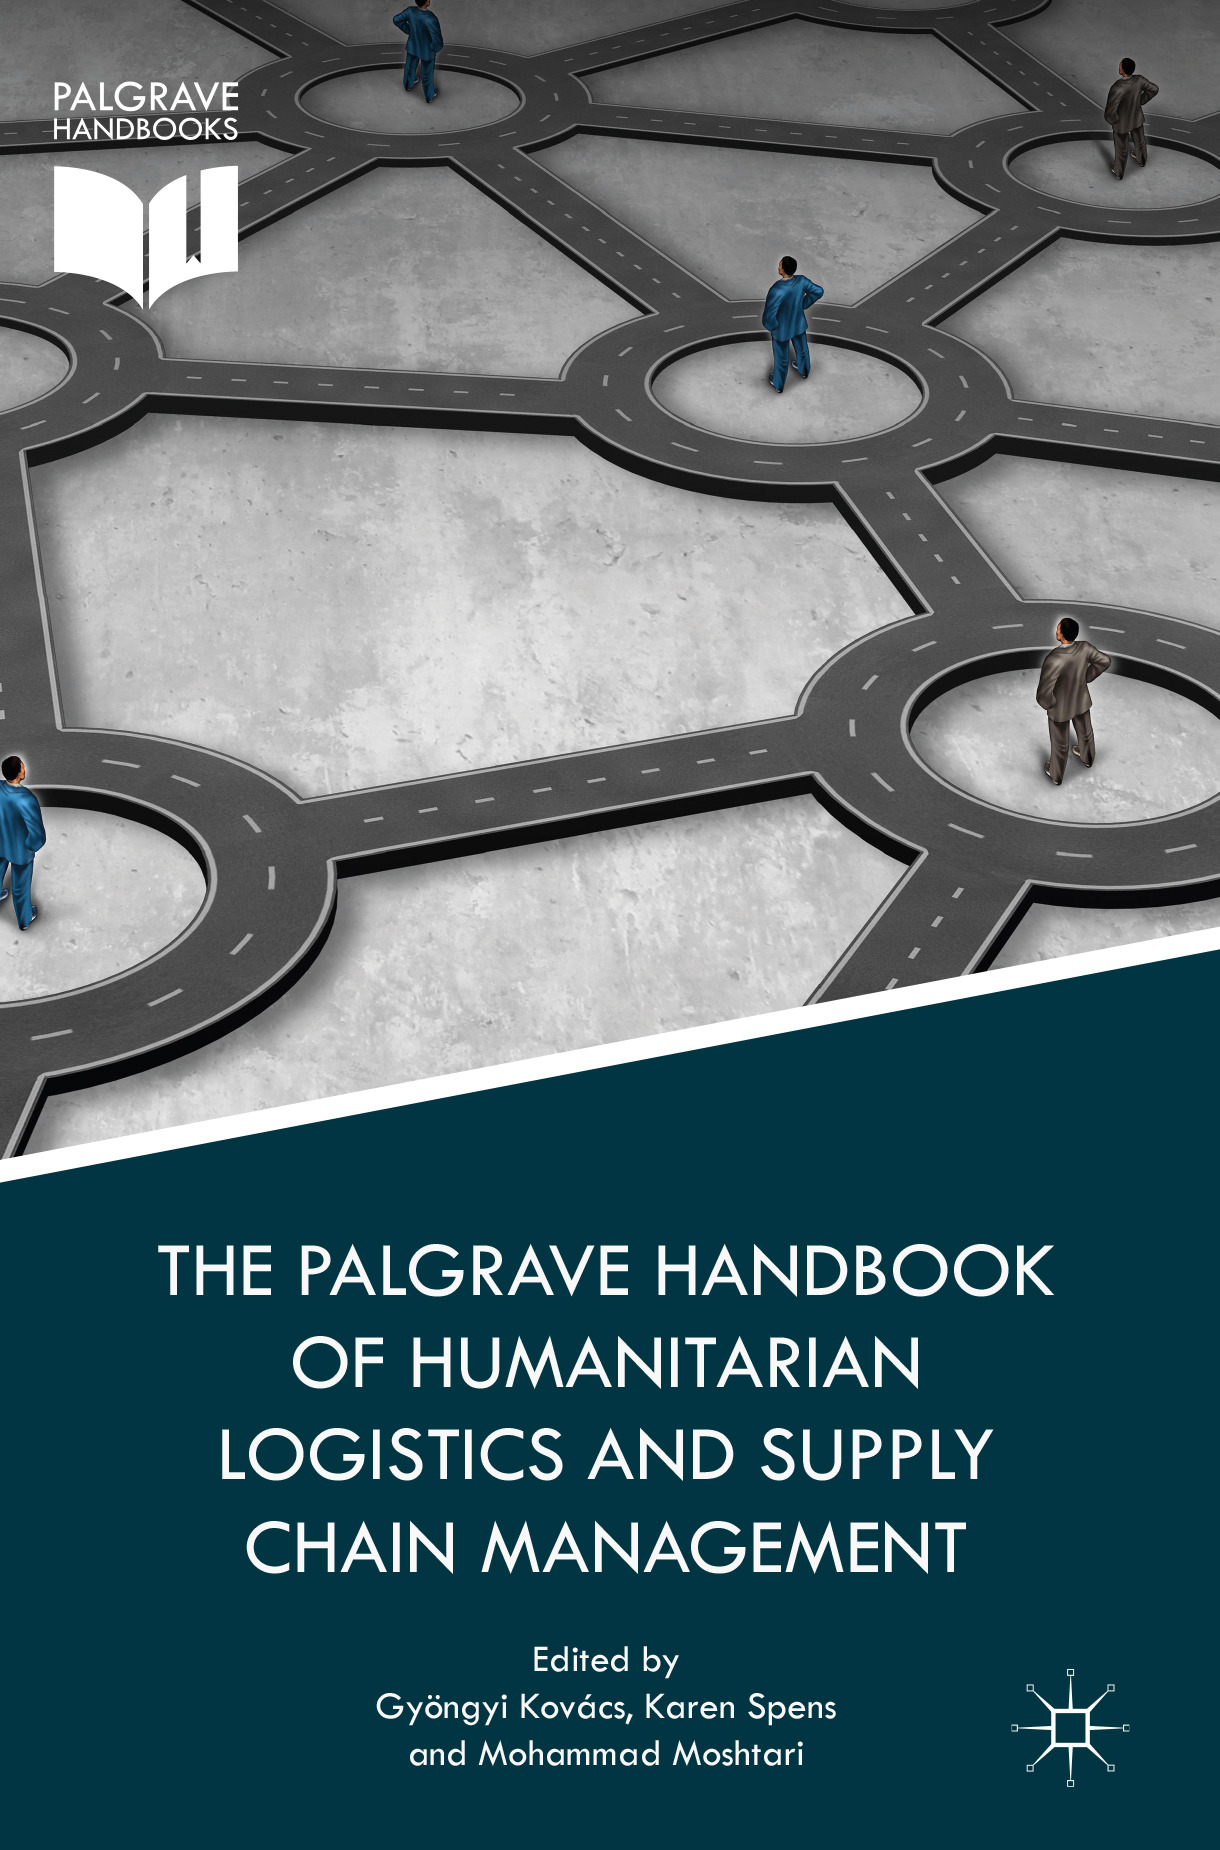 Kovács, Gyöngyi - The Palgrave Handbook of Humanitarian Logistics and Supply Chain Management, ebook